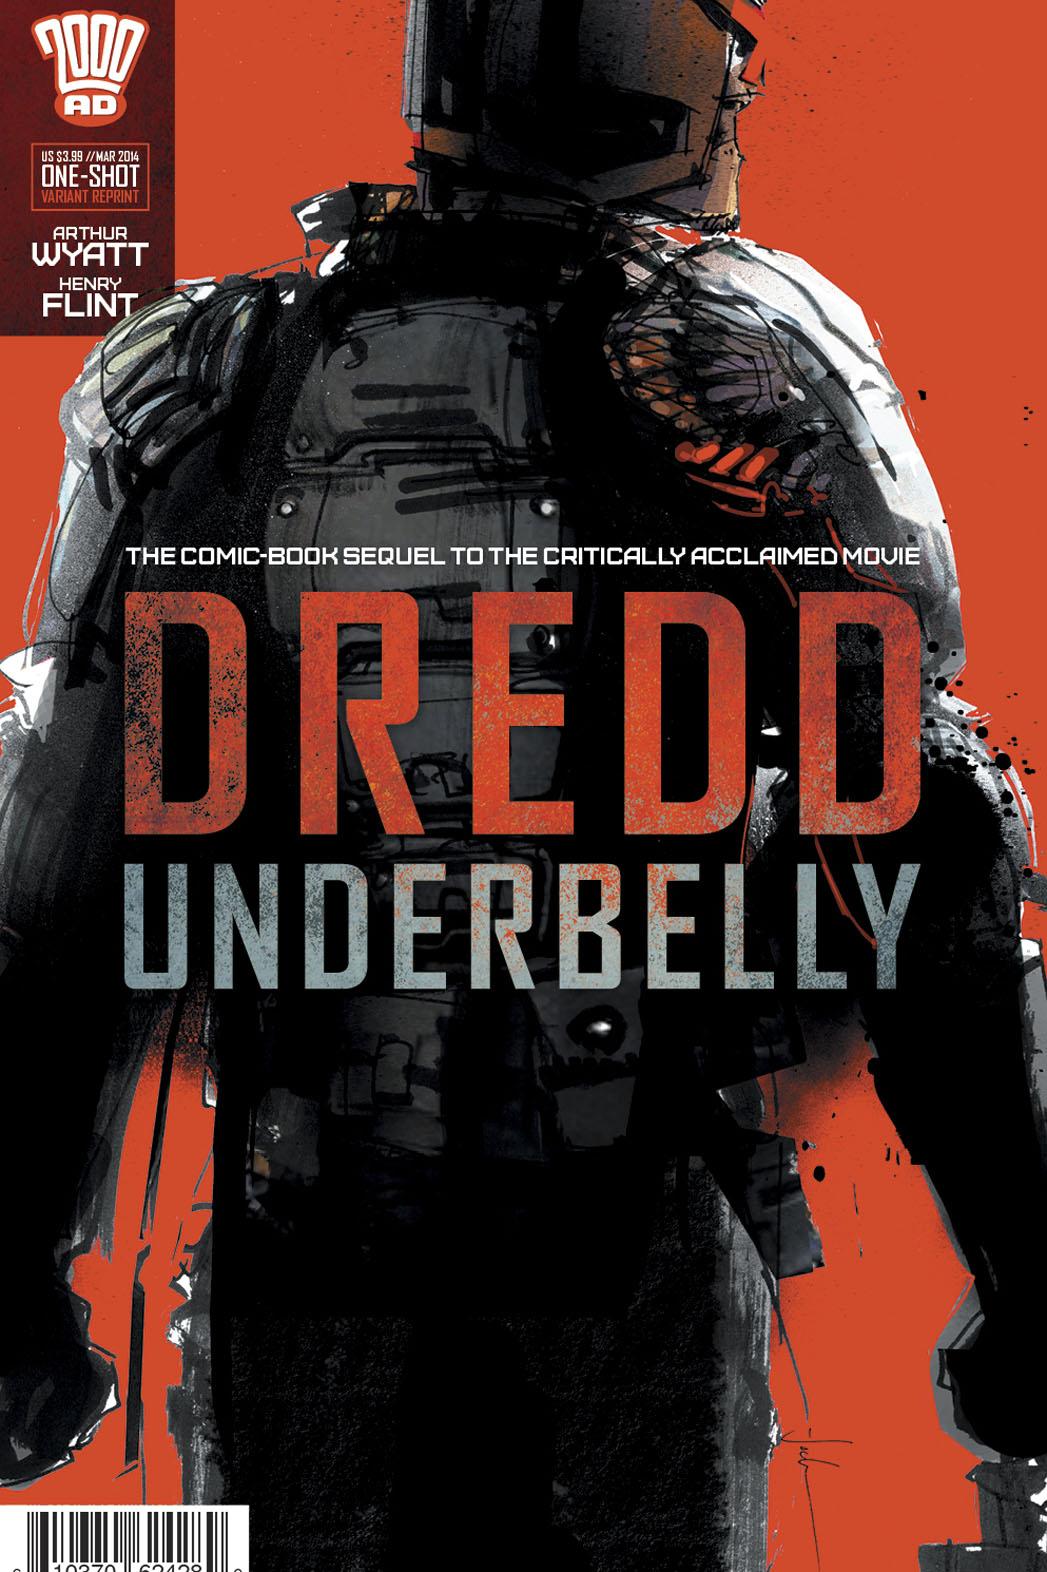 Dredd Underbelly Jock Cover - P 2014